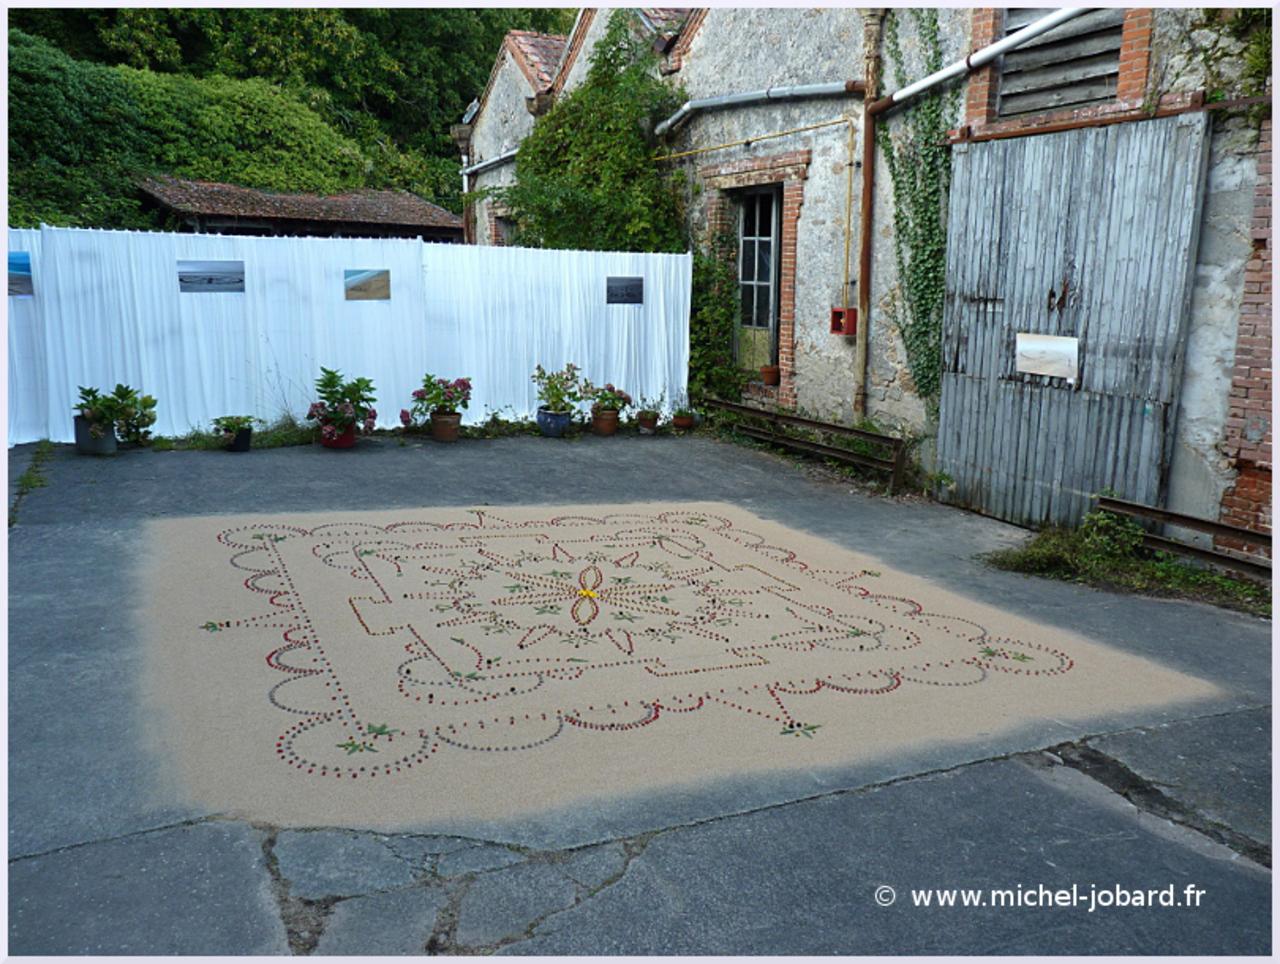 Land-art-thibet-06.jpg